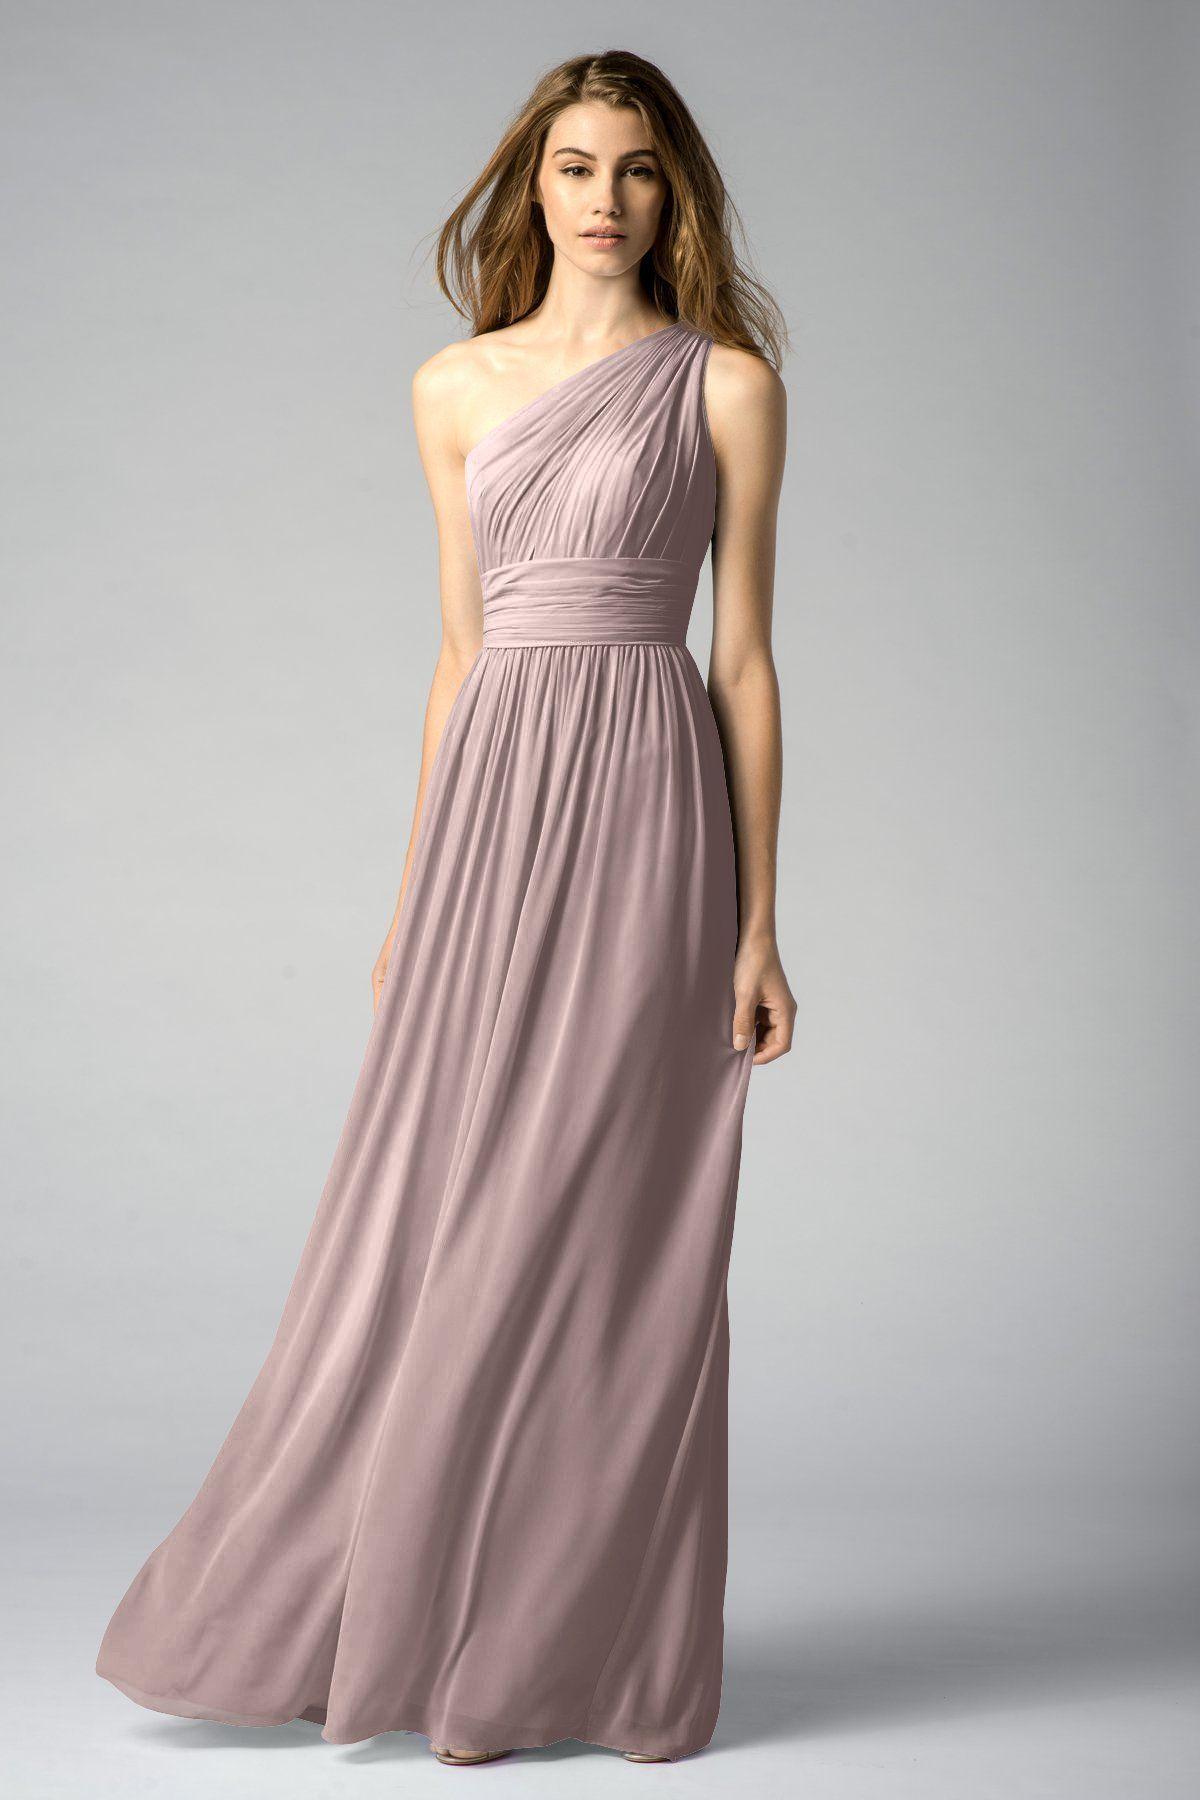 cefaea70ae92 $212.40 (orig $236) at Bella Bridesmaids | Watters Maids Dress Tamara |  DRESS TAMARA STYLE 7546I | color mink or stone